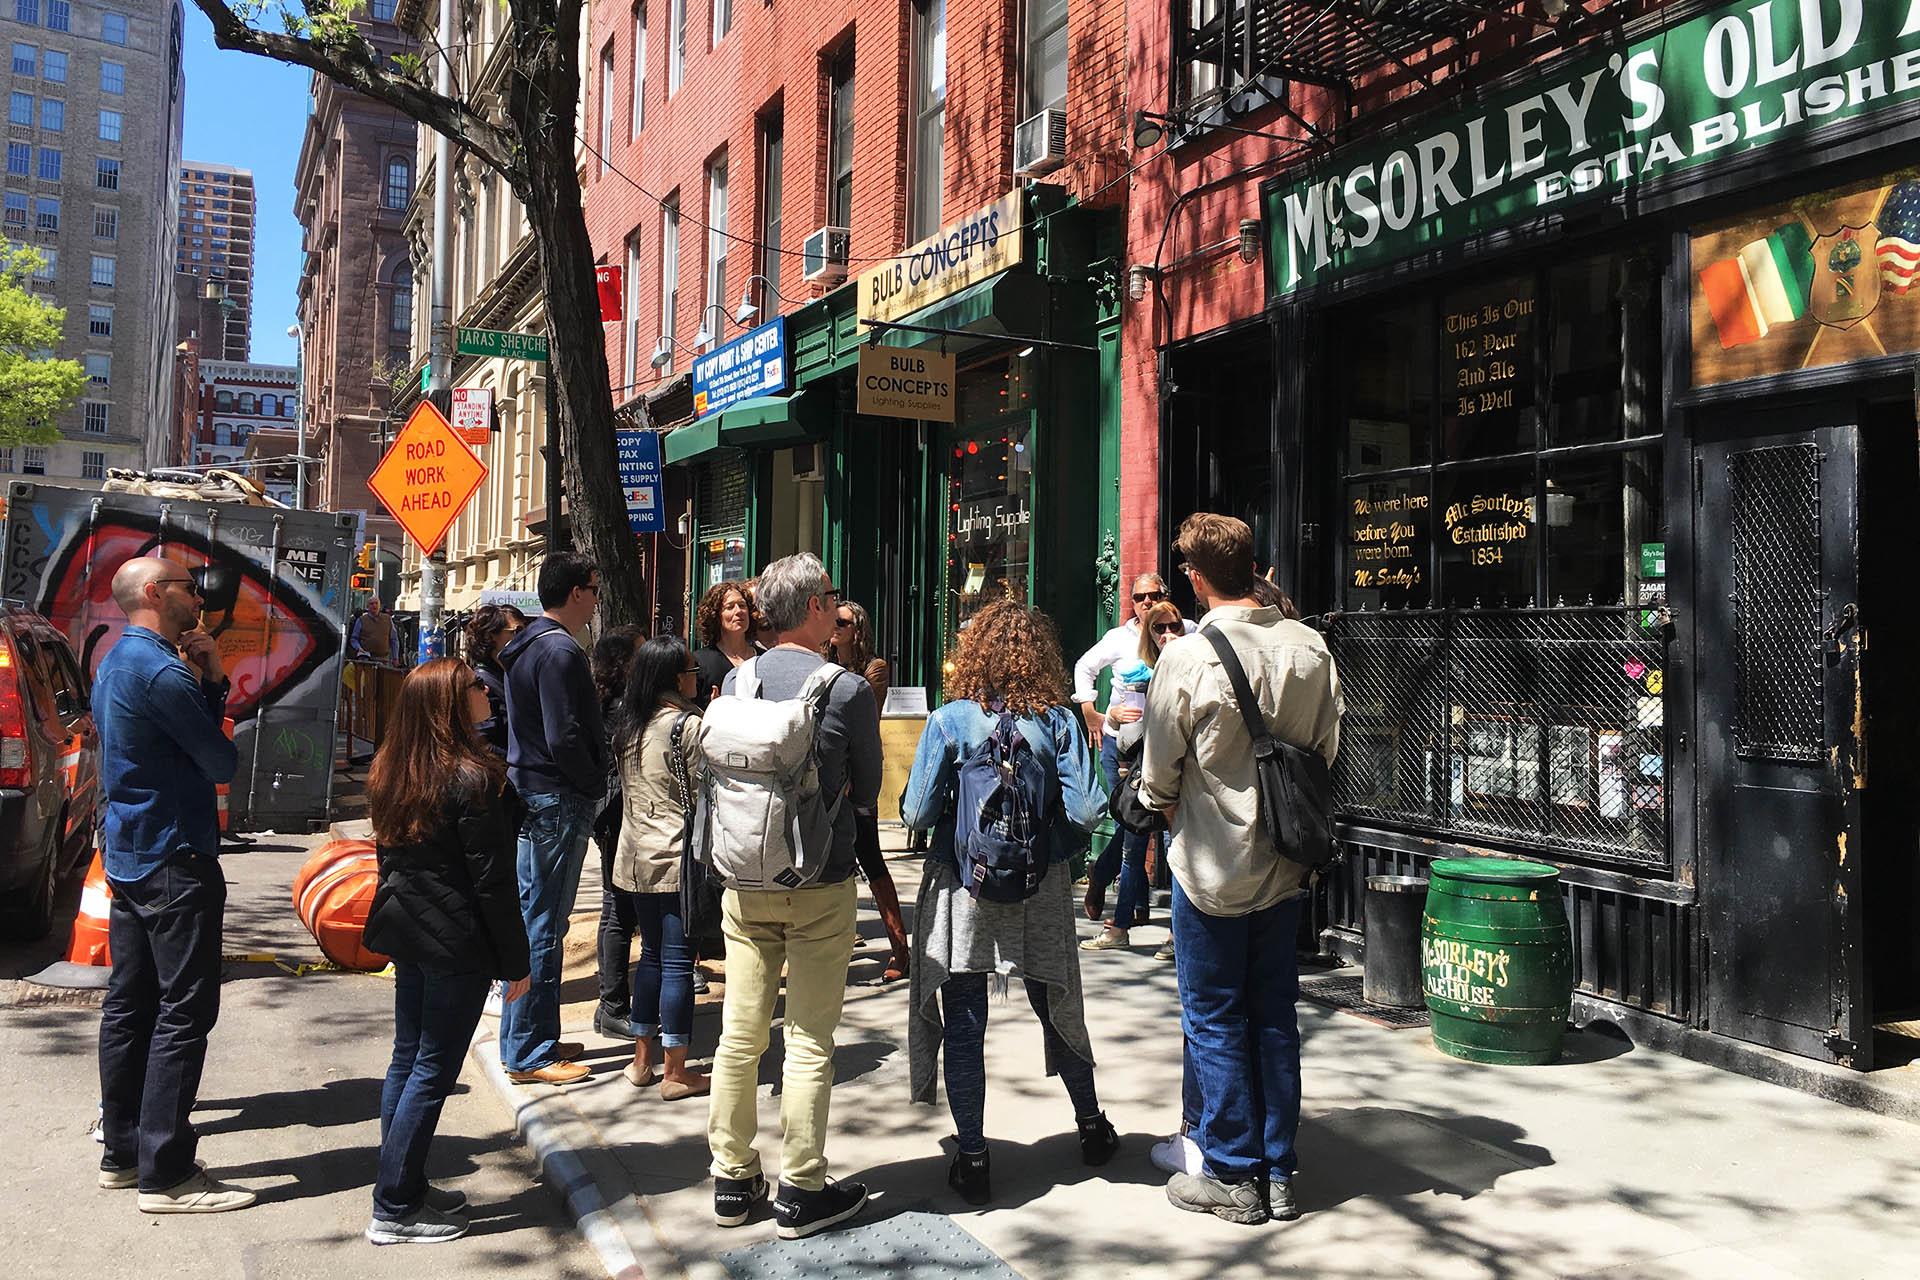 prohibition history tour - new york city bar tour